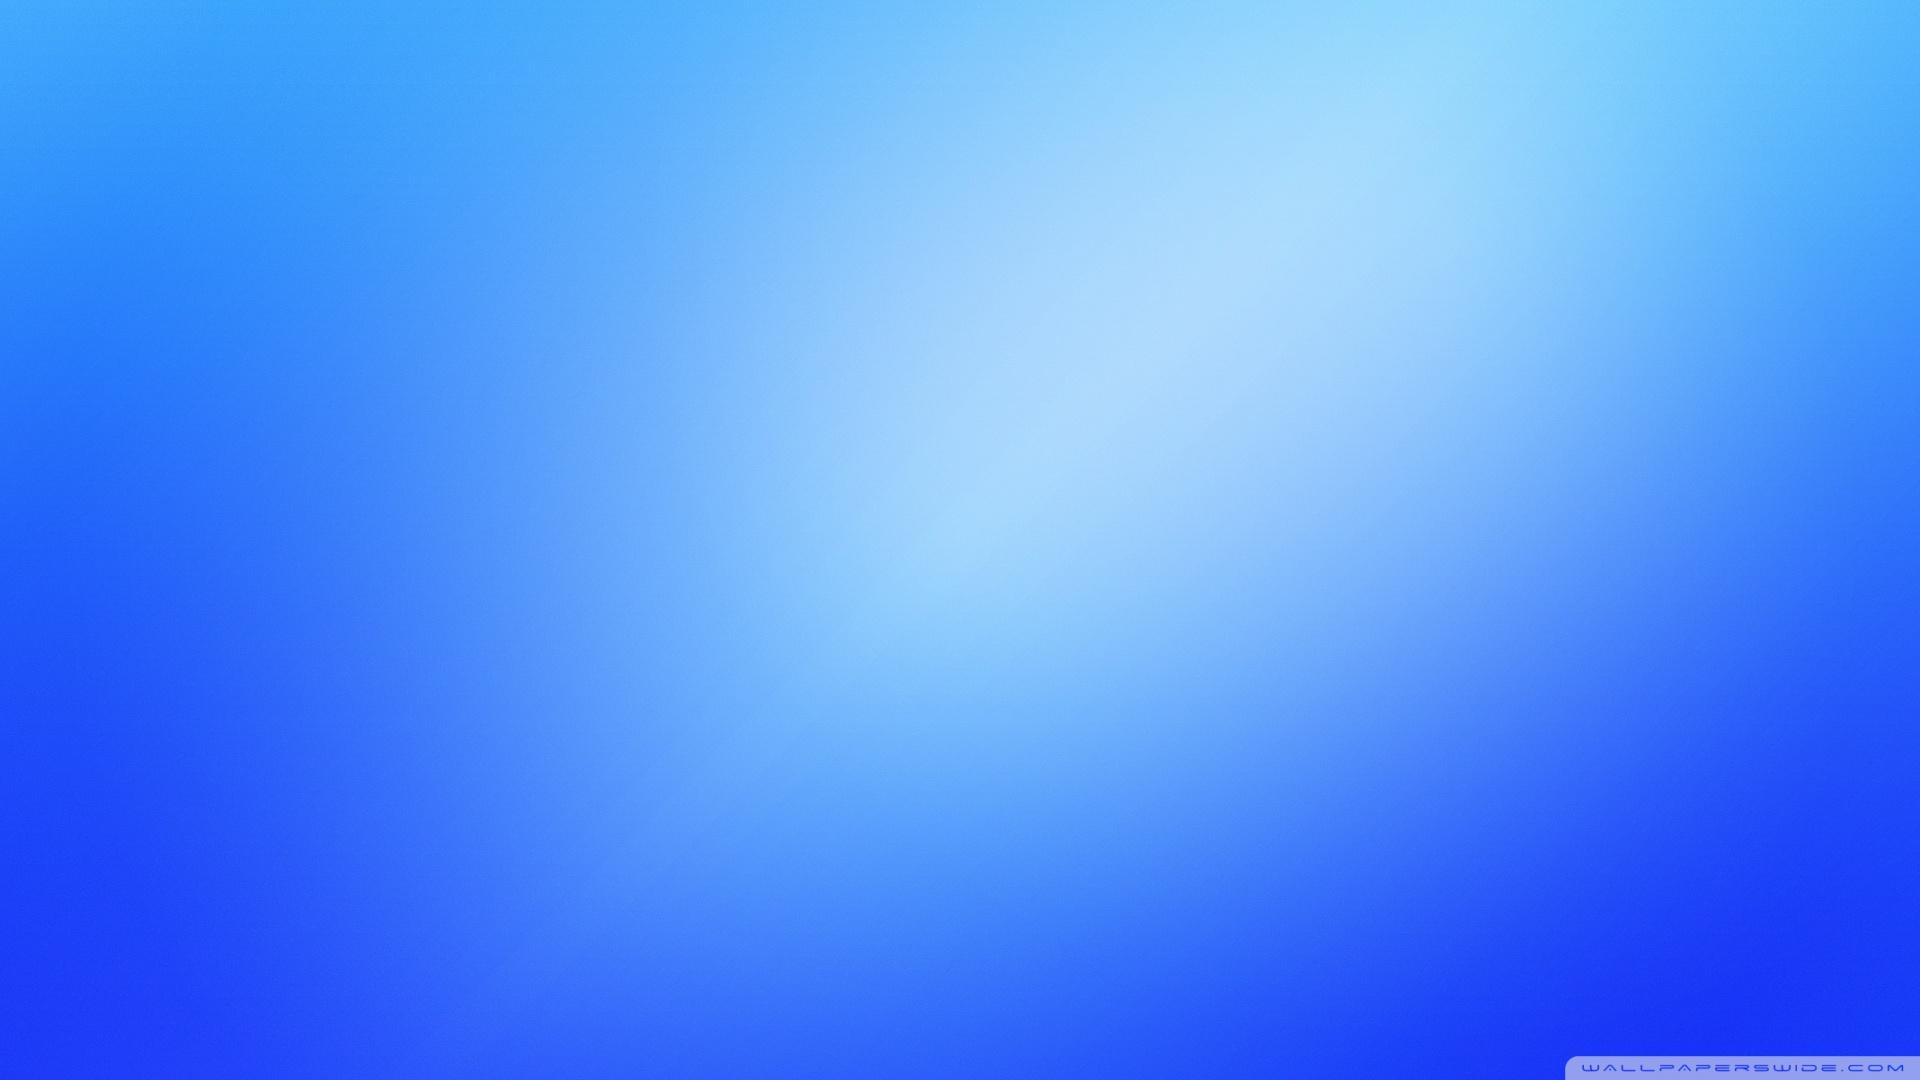 1920x1080 Fall Hd Wallpaper Blurry Blue Background I 4k Hd Desktop Wallpaper For 4k